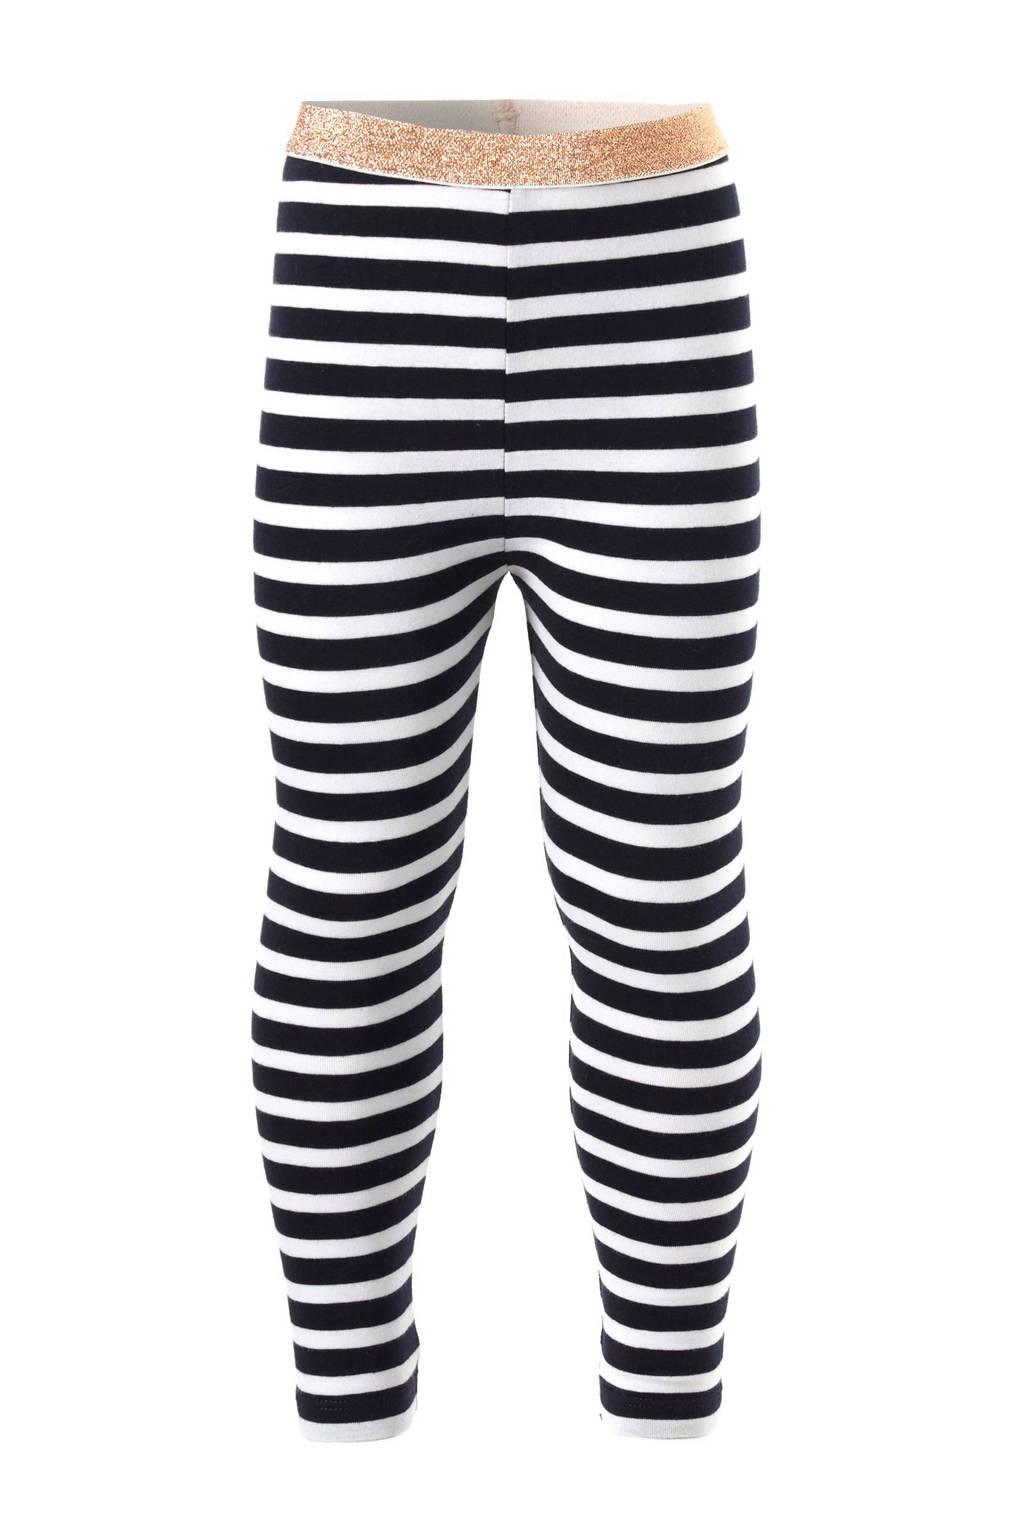 Noppies legging, Donkerblauw / Wit